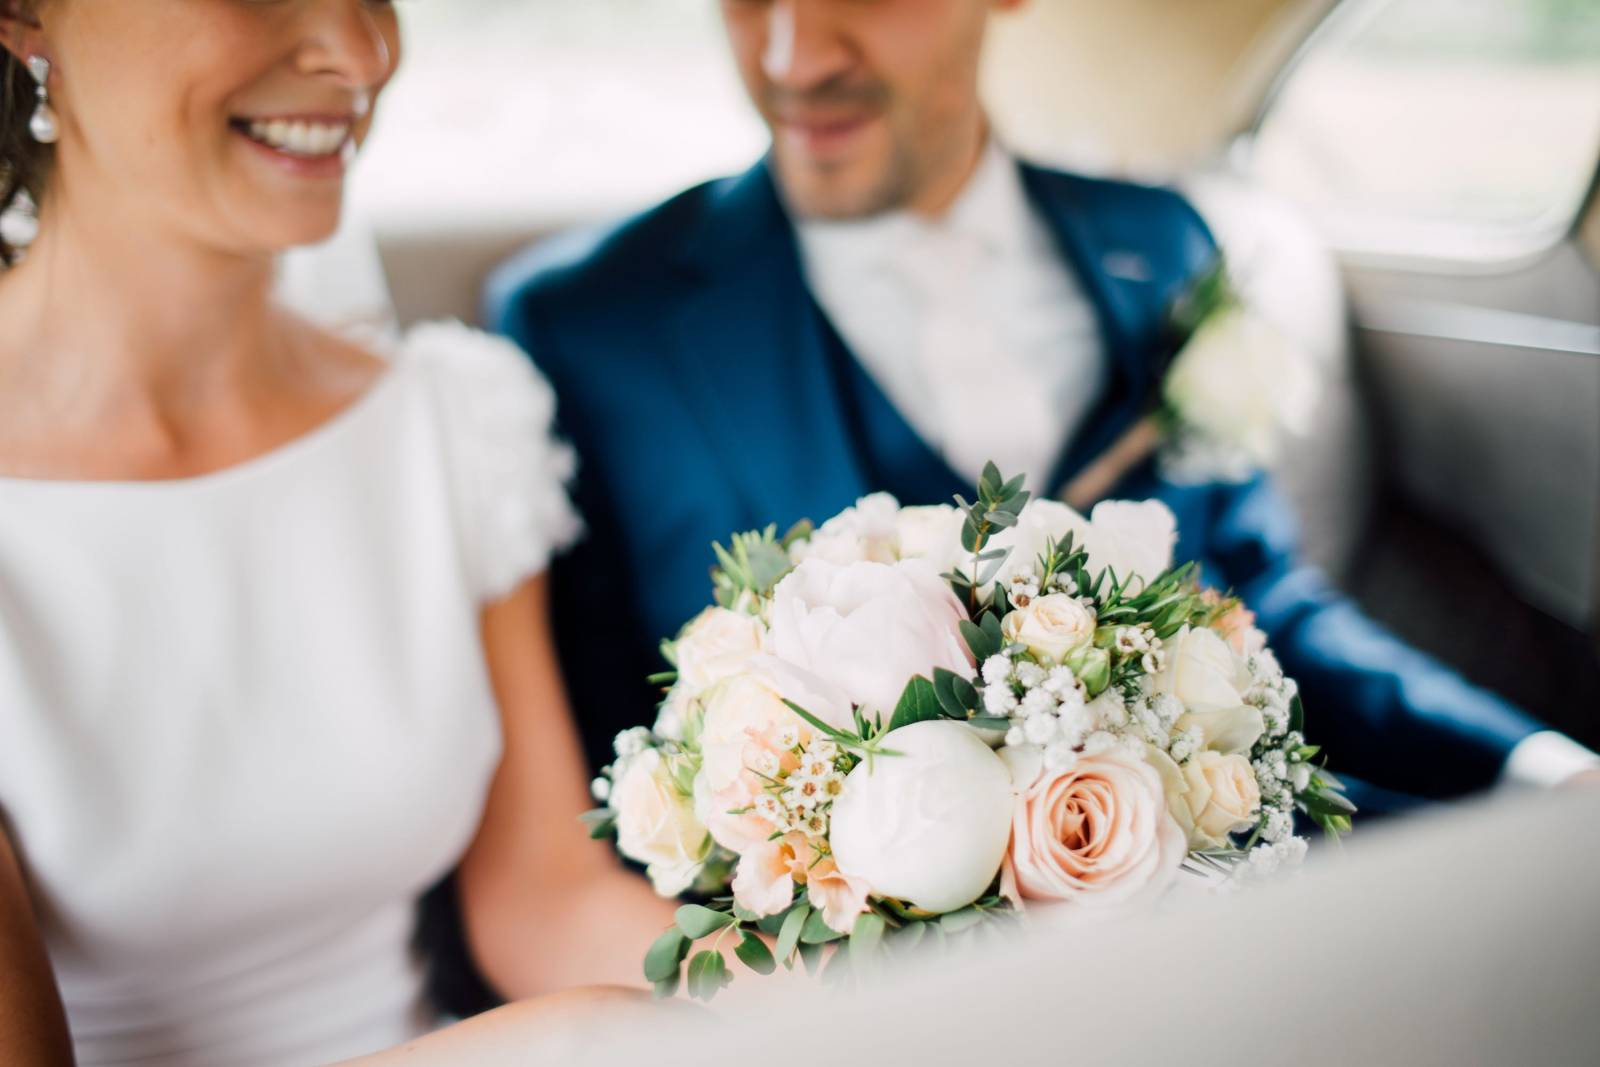 Carpe Diem Bloemen & Decoratie - House of Weddings  - 68